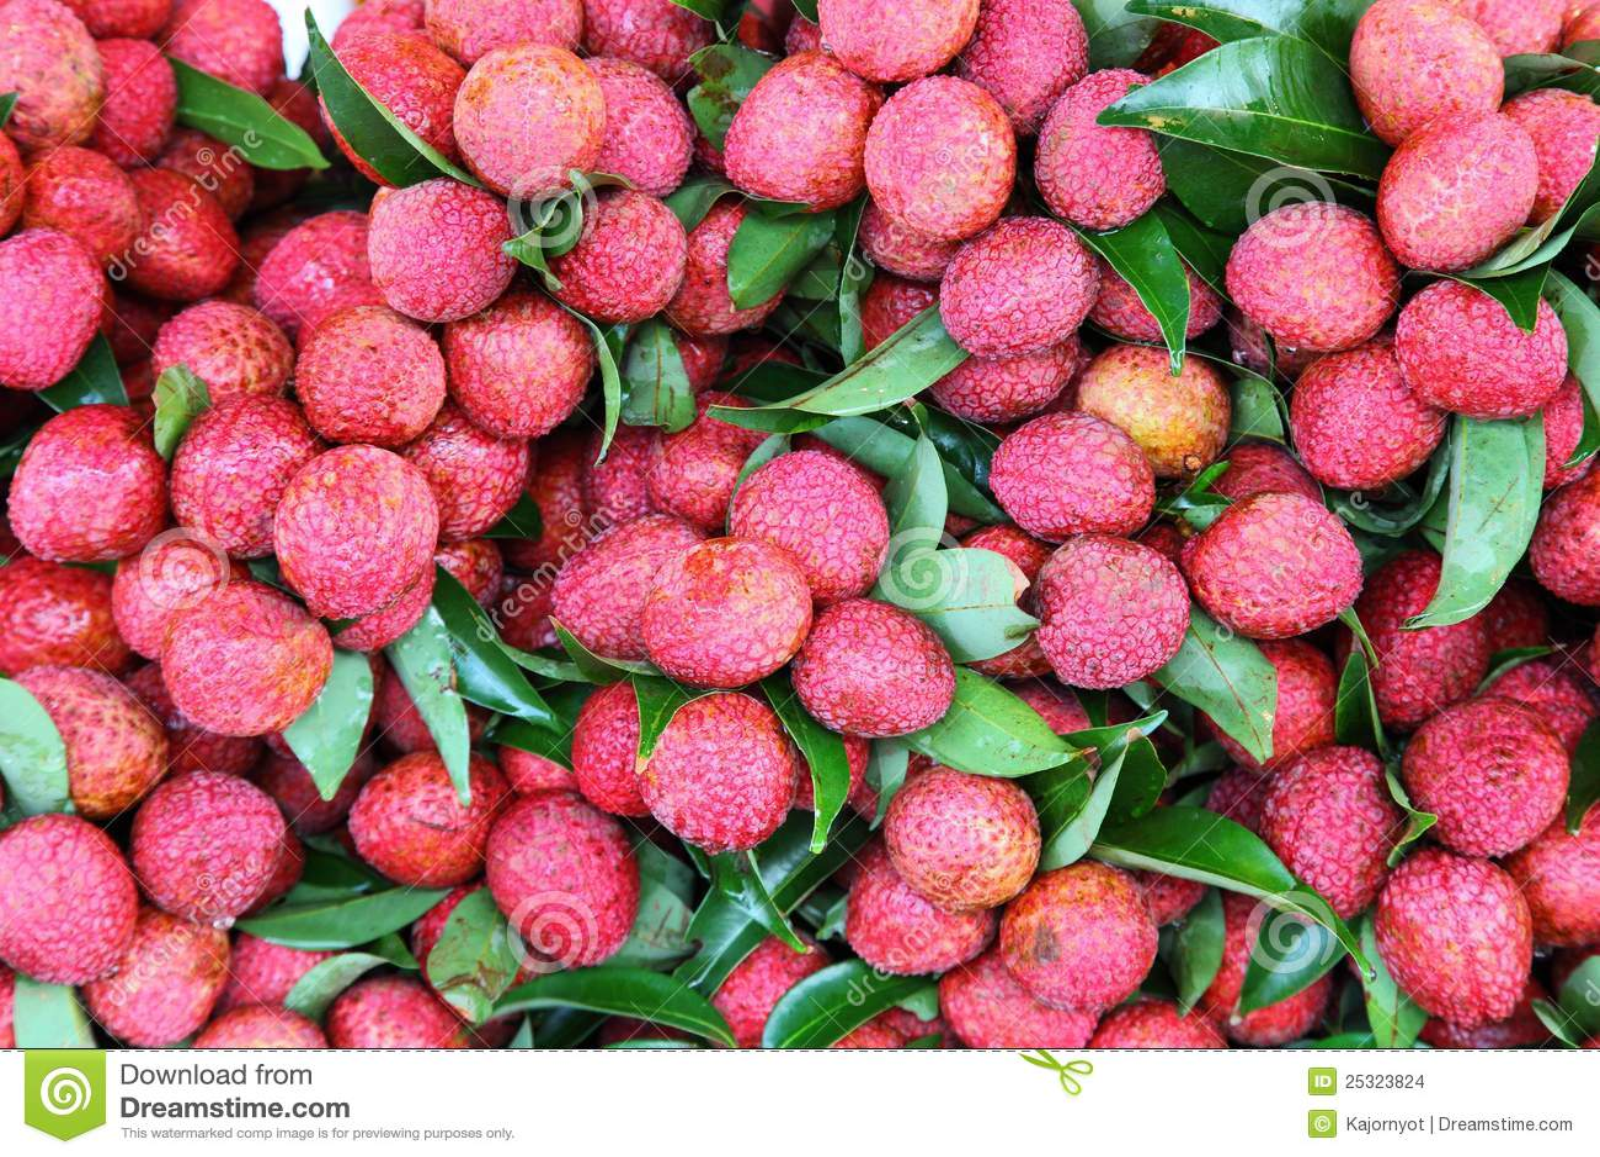 Berry Natural Food Market